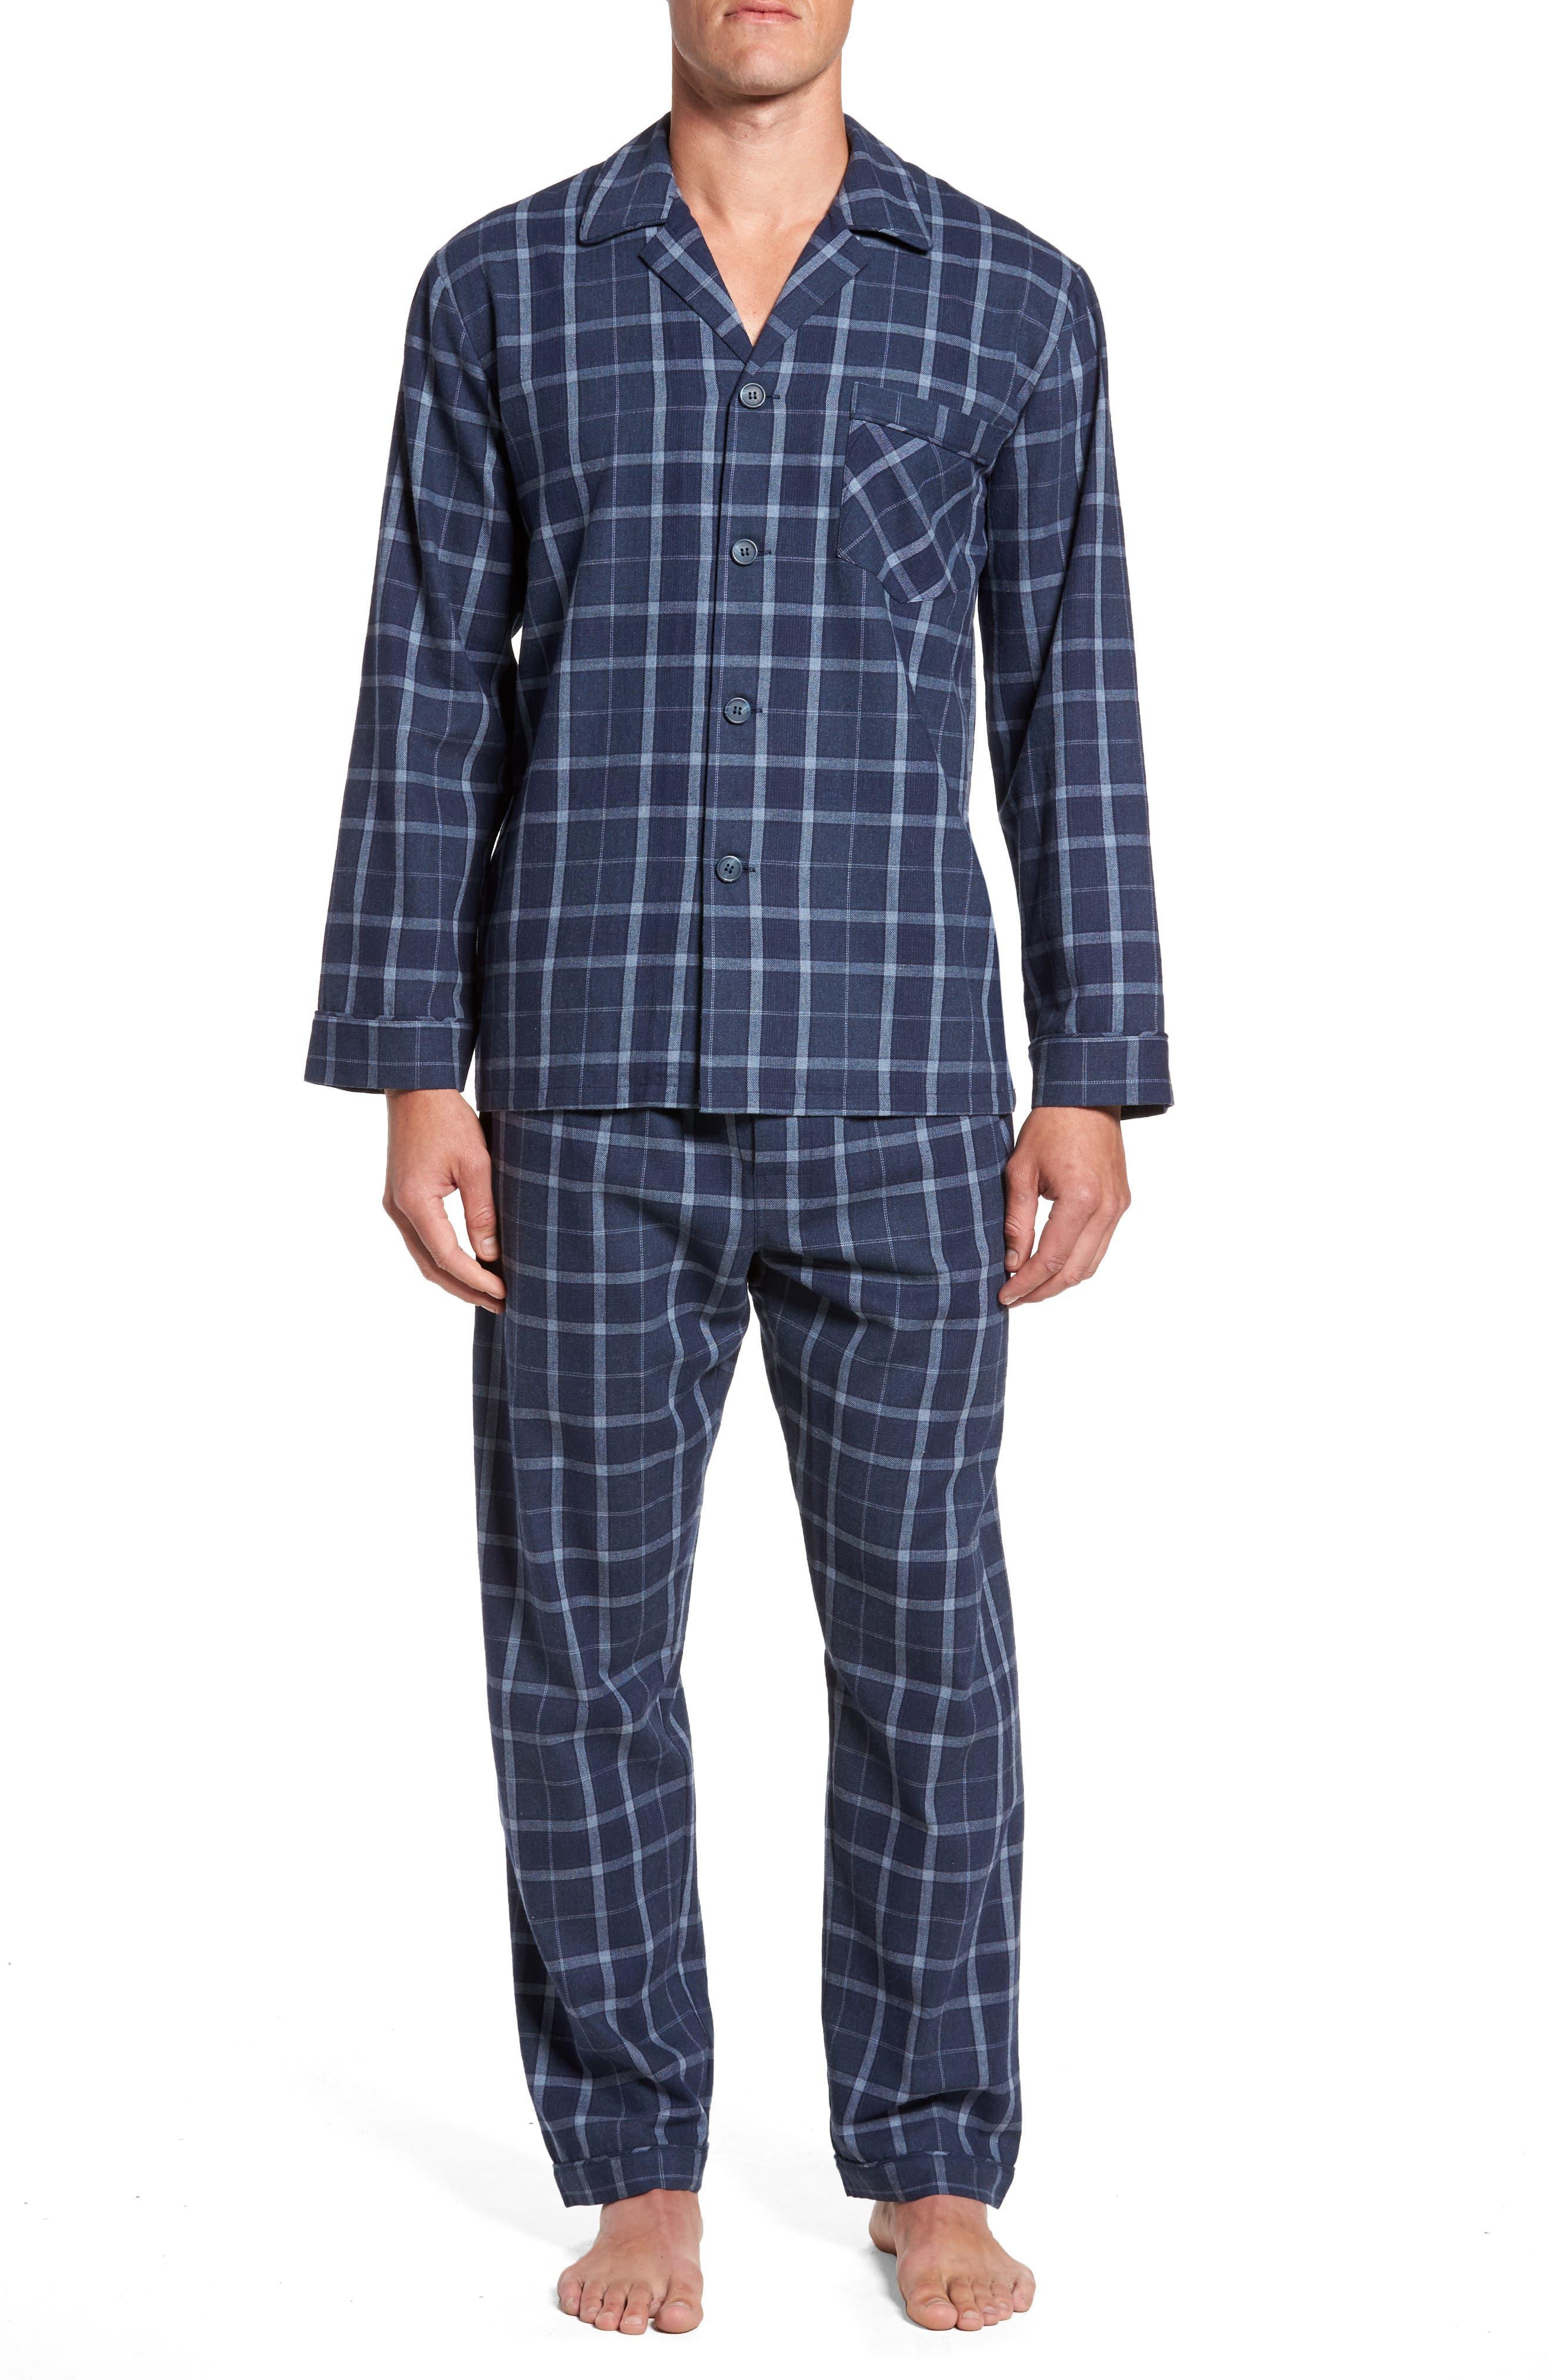 Guiness Plaid Pajama Set,                             Main thumbnail 1, color,                             400